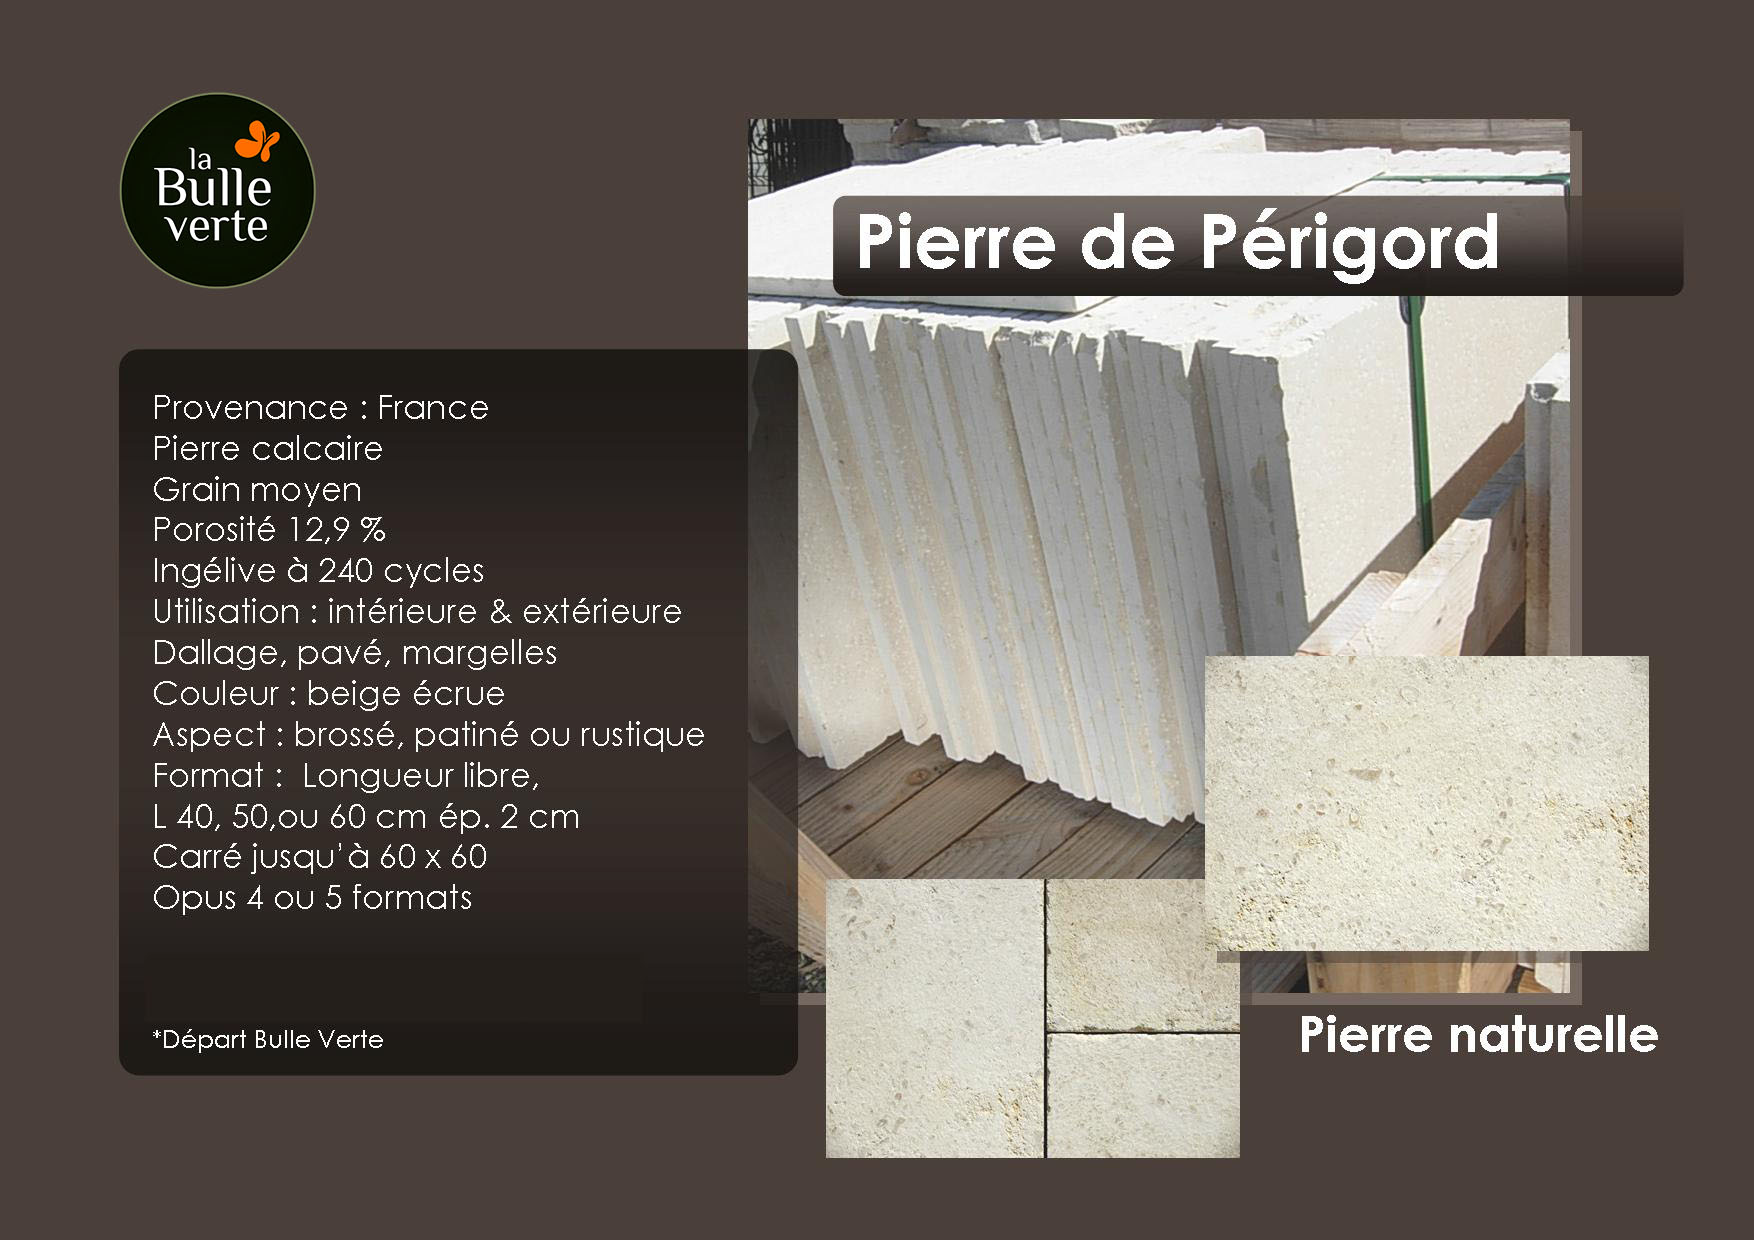 Pierre de Périgord - pierre naturelle - La Bulle Verte